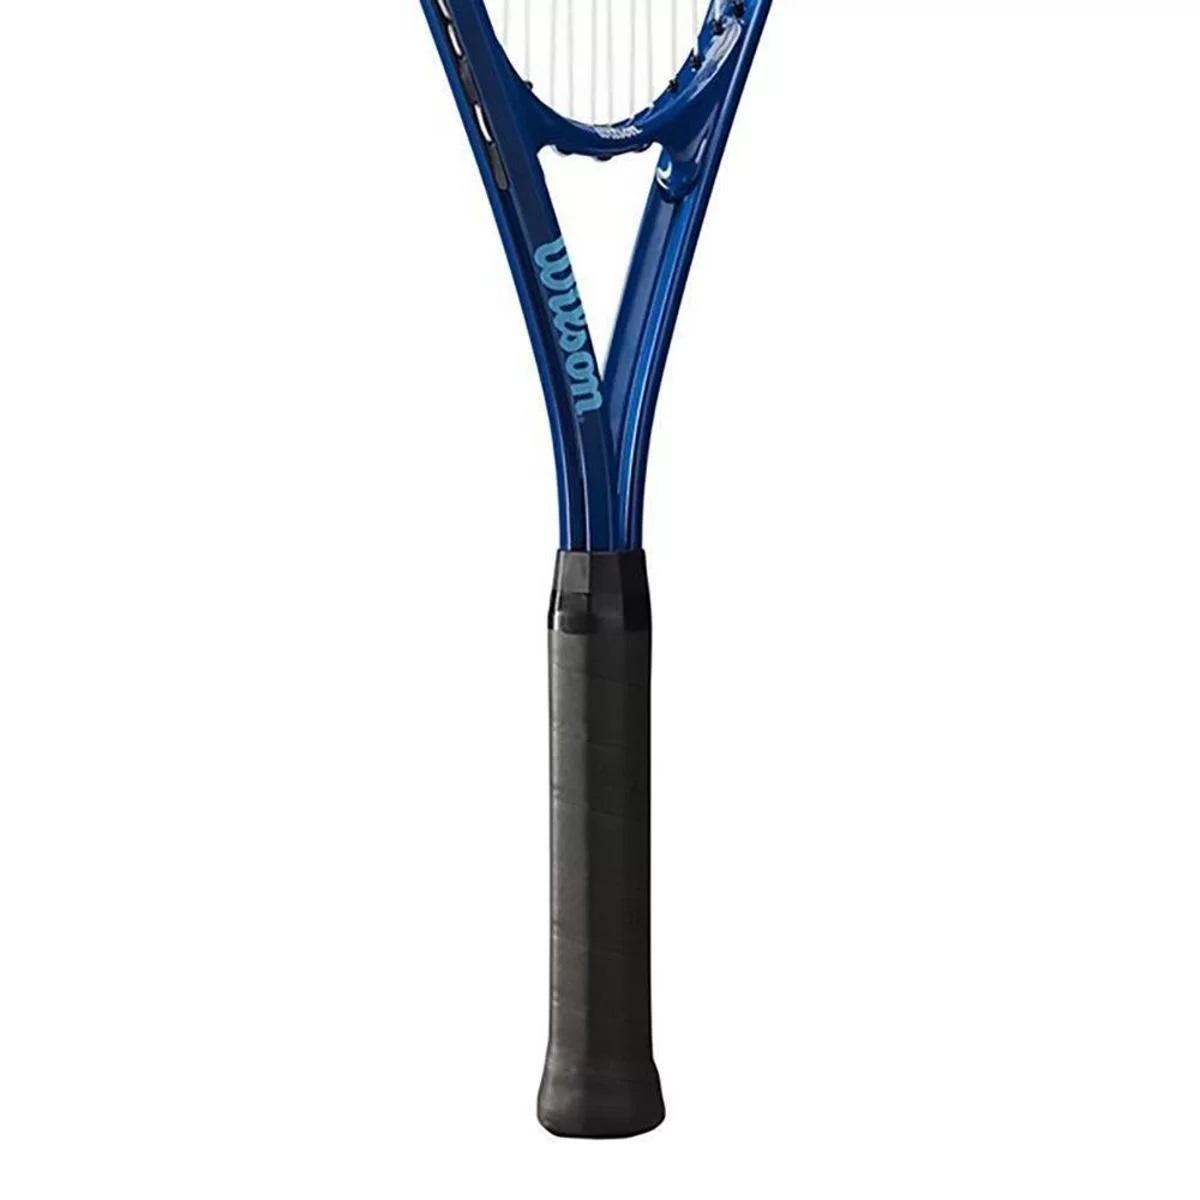 Raquete Tênis Wilson Ultra Power XL 112 Marinho